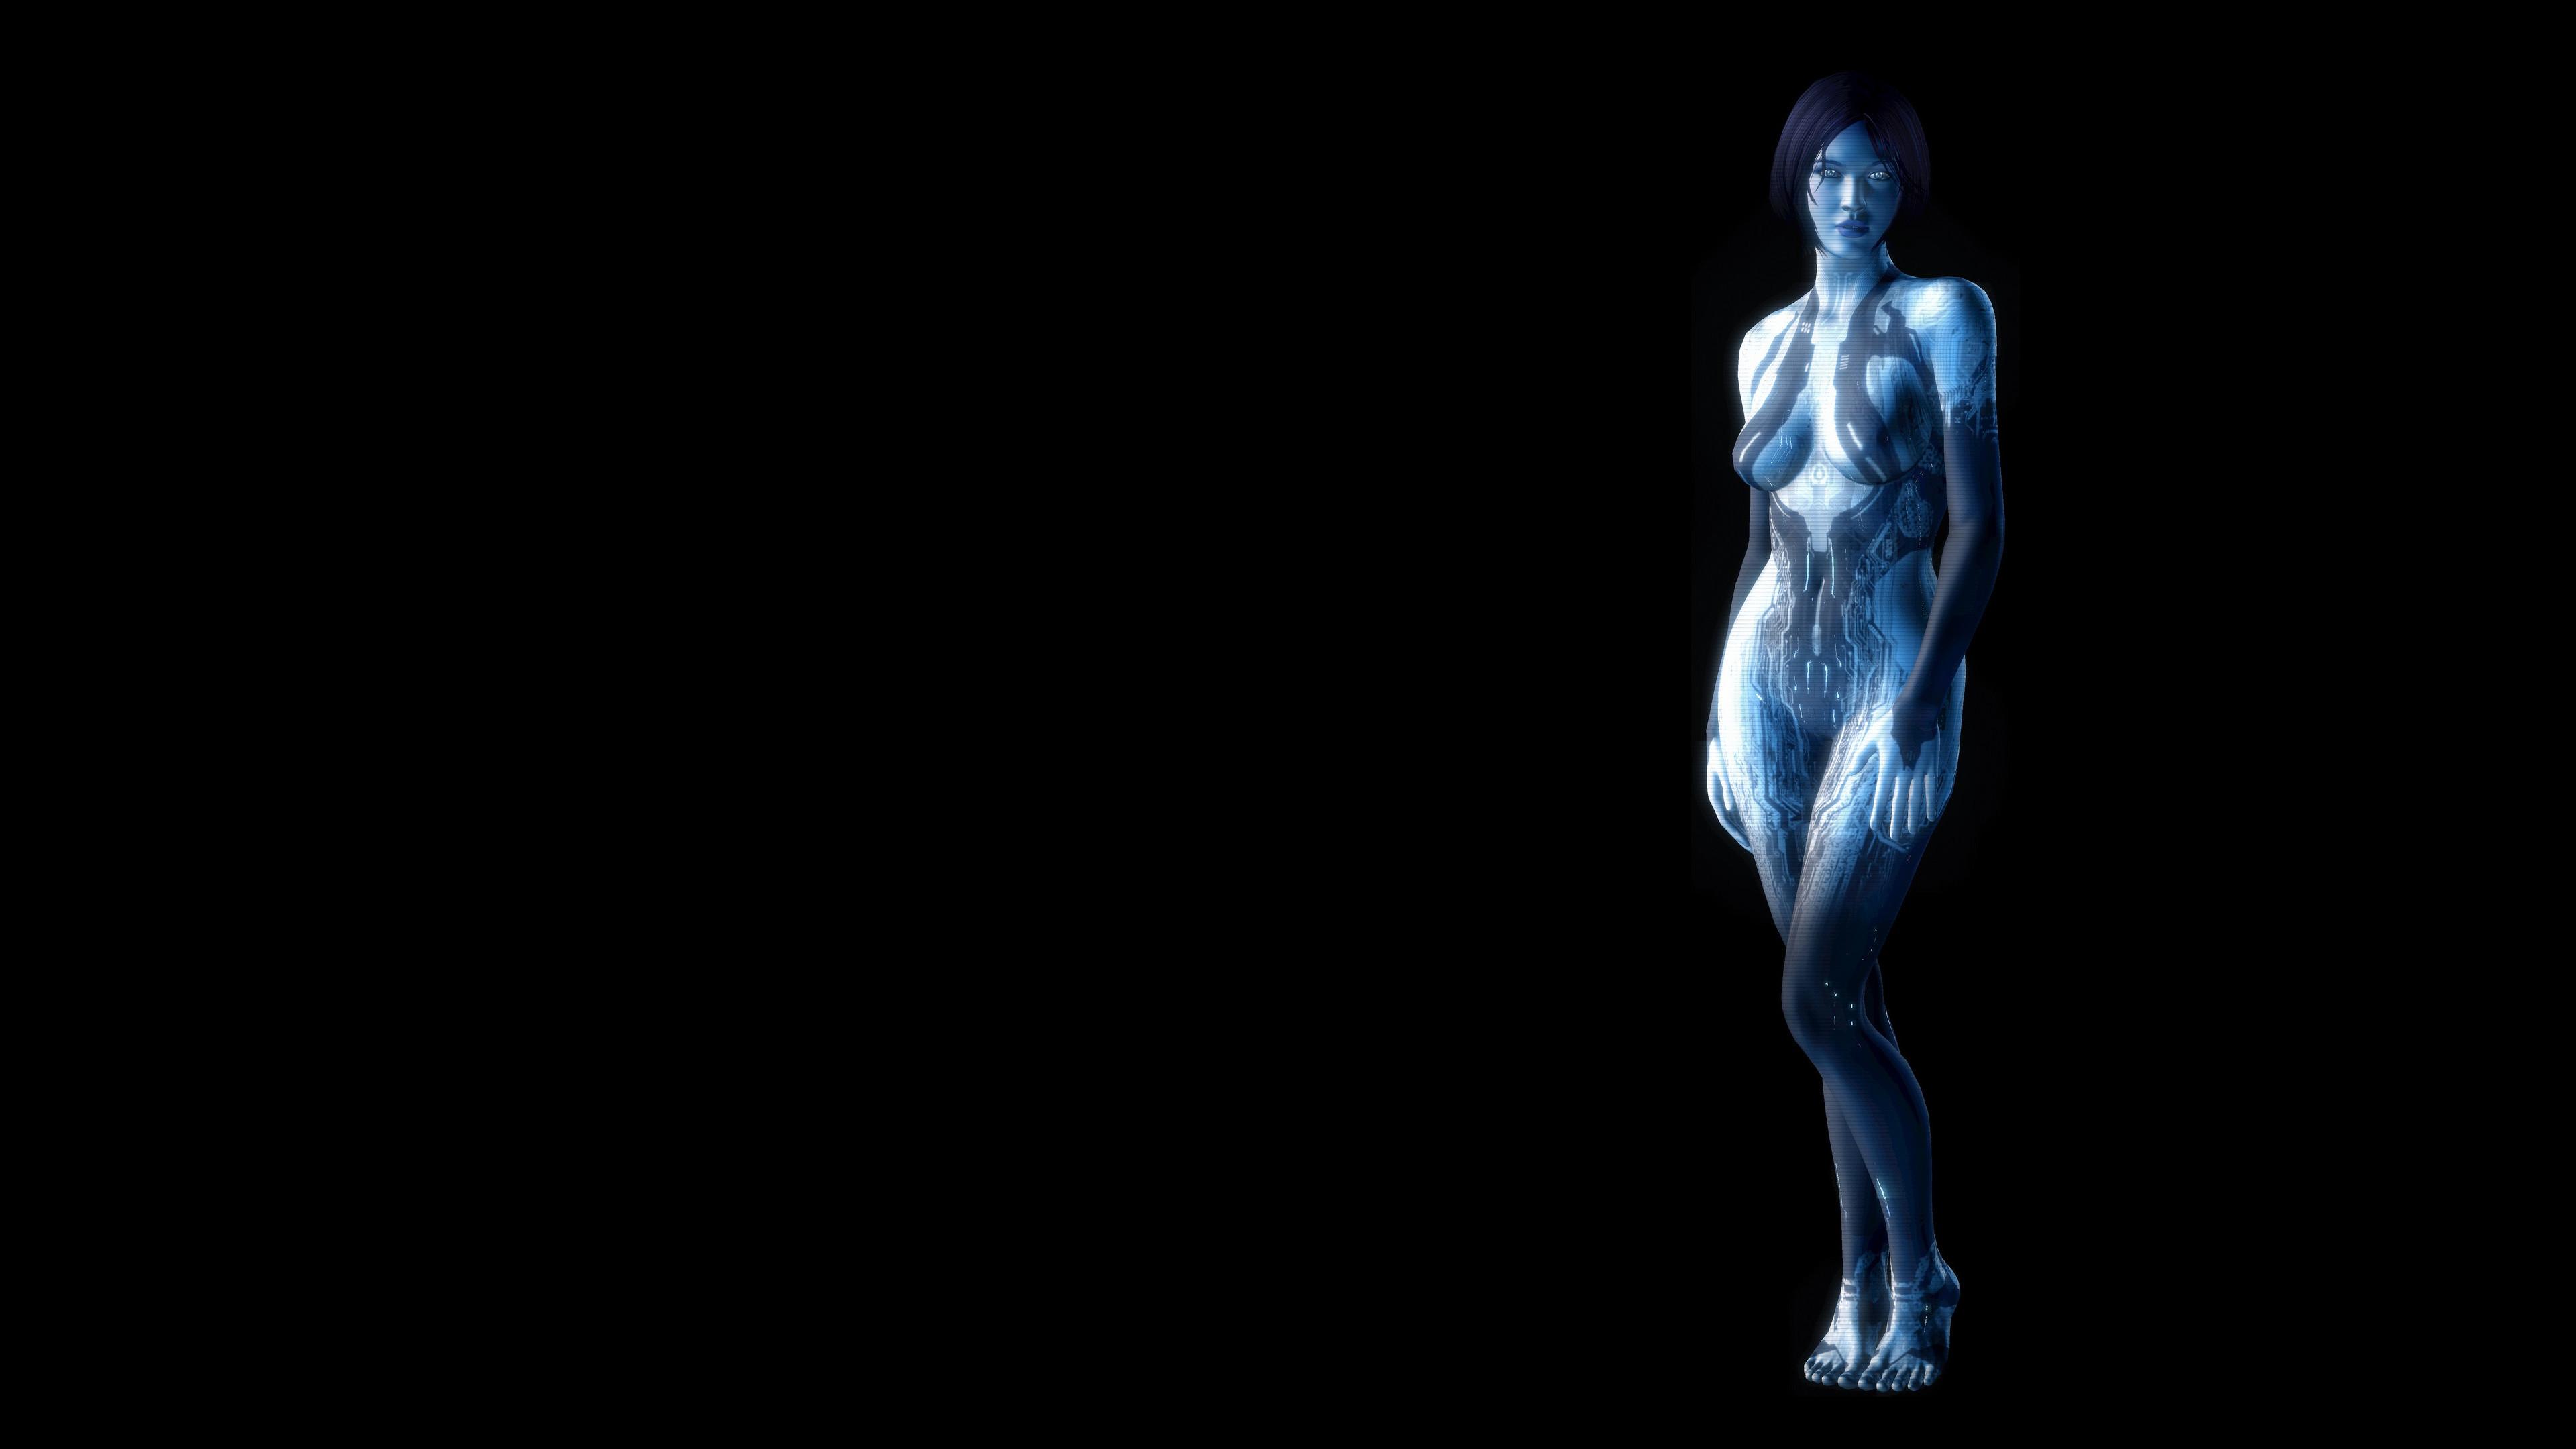 Cortana 4K Wallpaper 67 Images